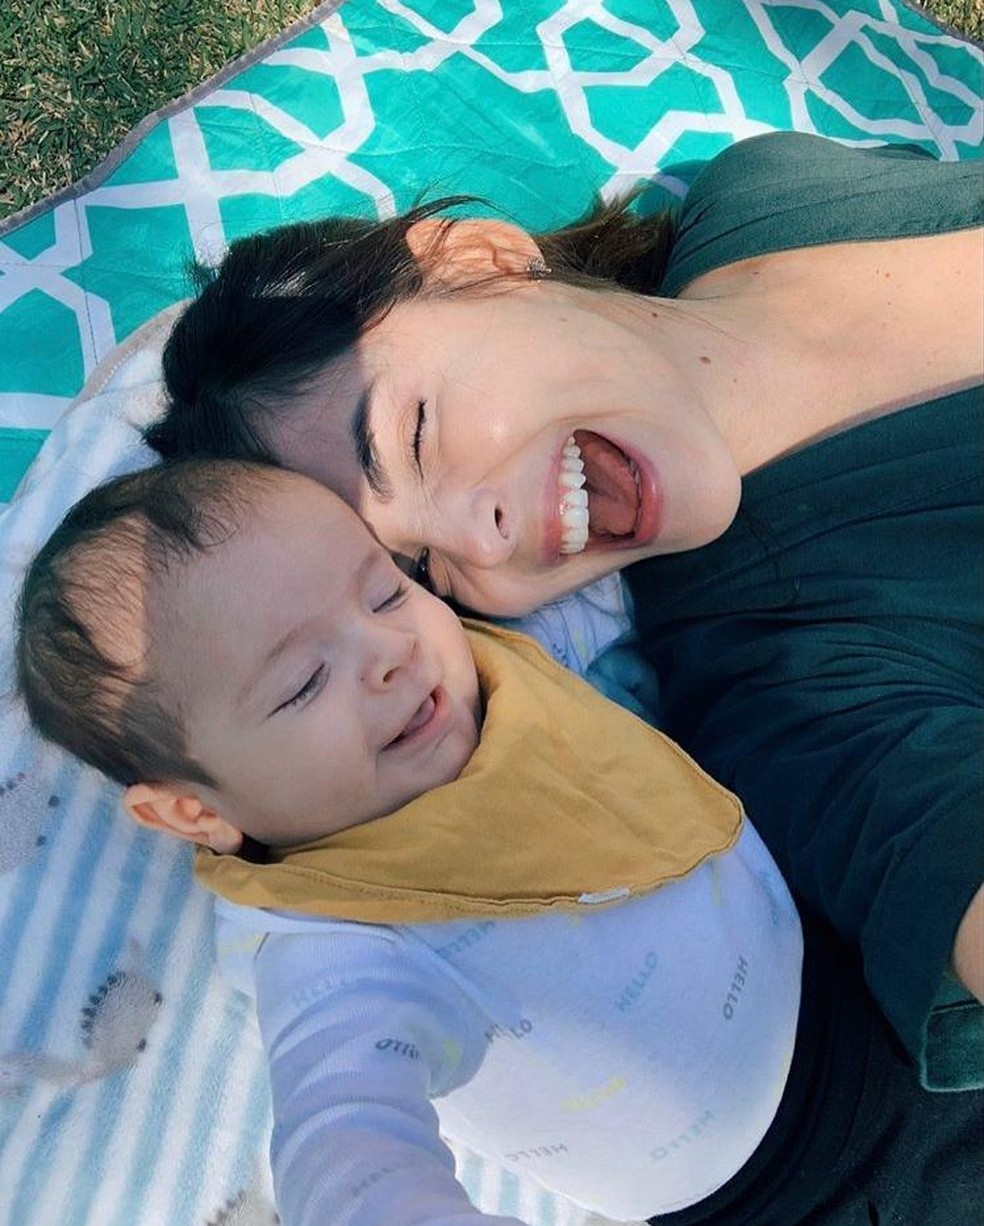 O pequeno é fruto do relacionamento entre Titi Muller e Tomás Bertoni. (Foto: Instagram)